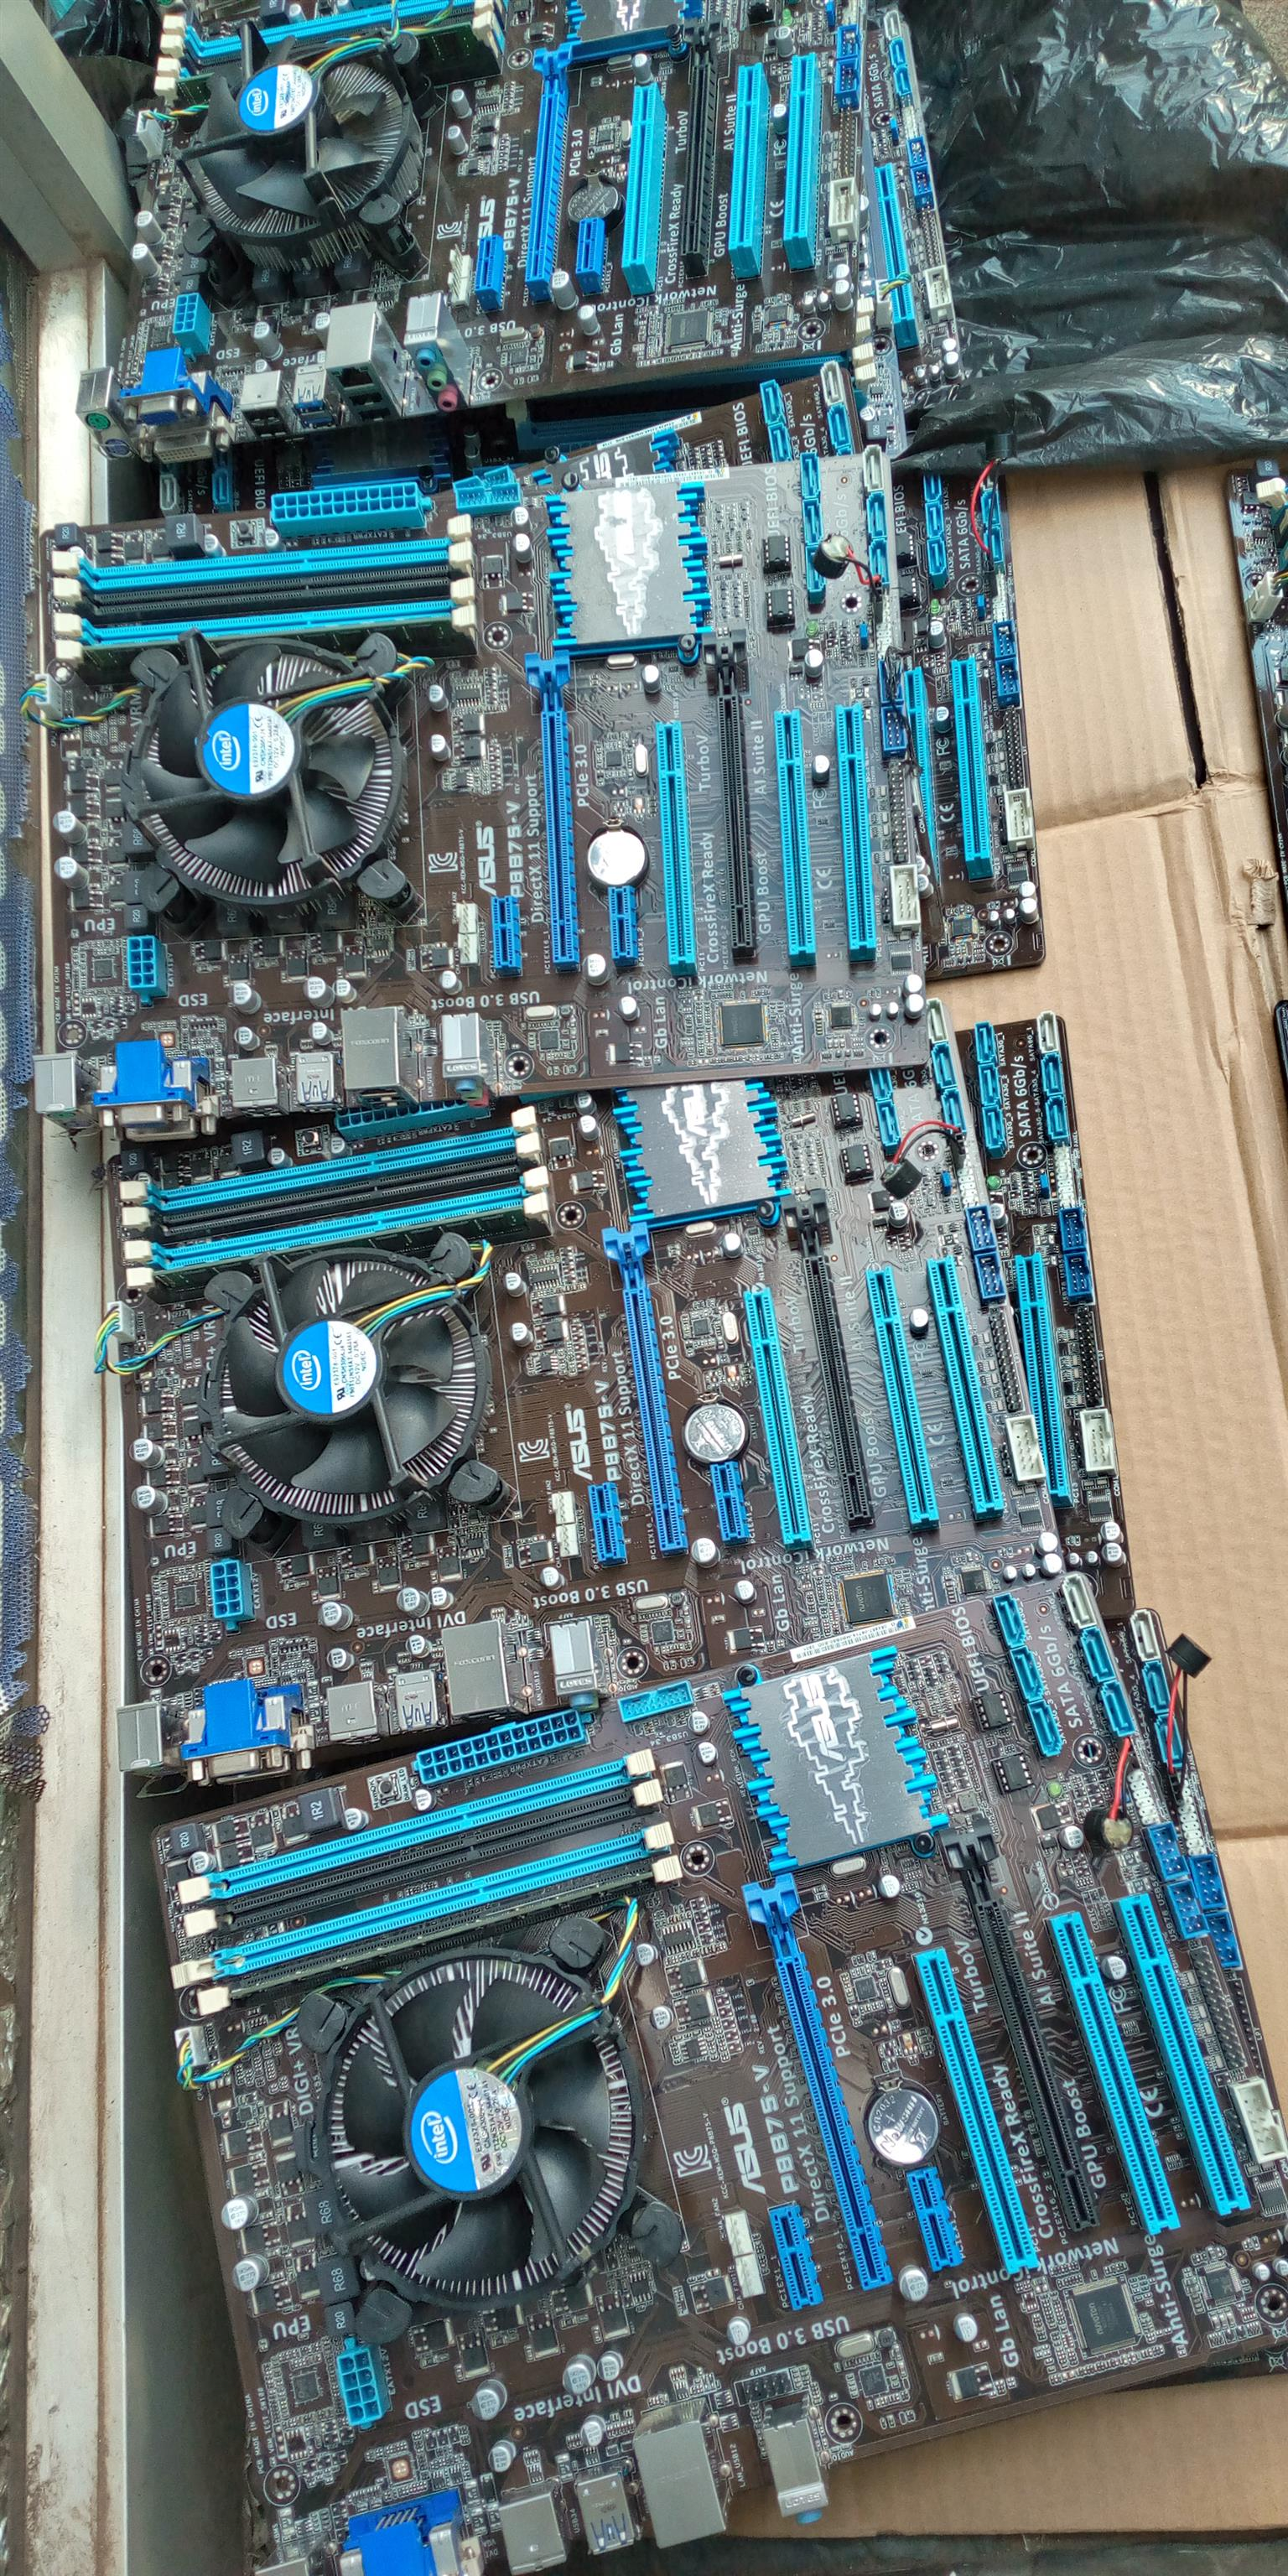 GAMING BOARD Sock 1155 board backplate on special